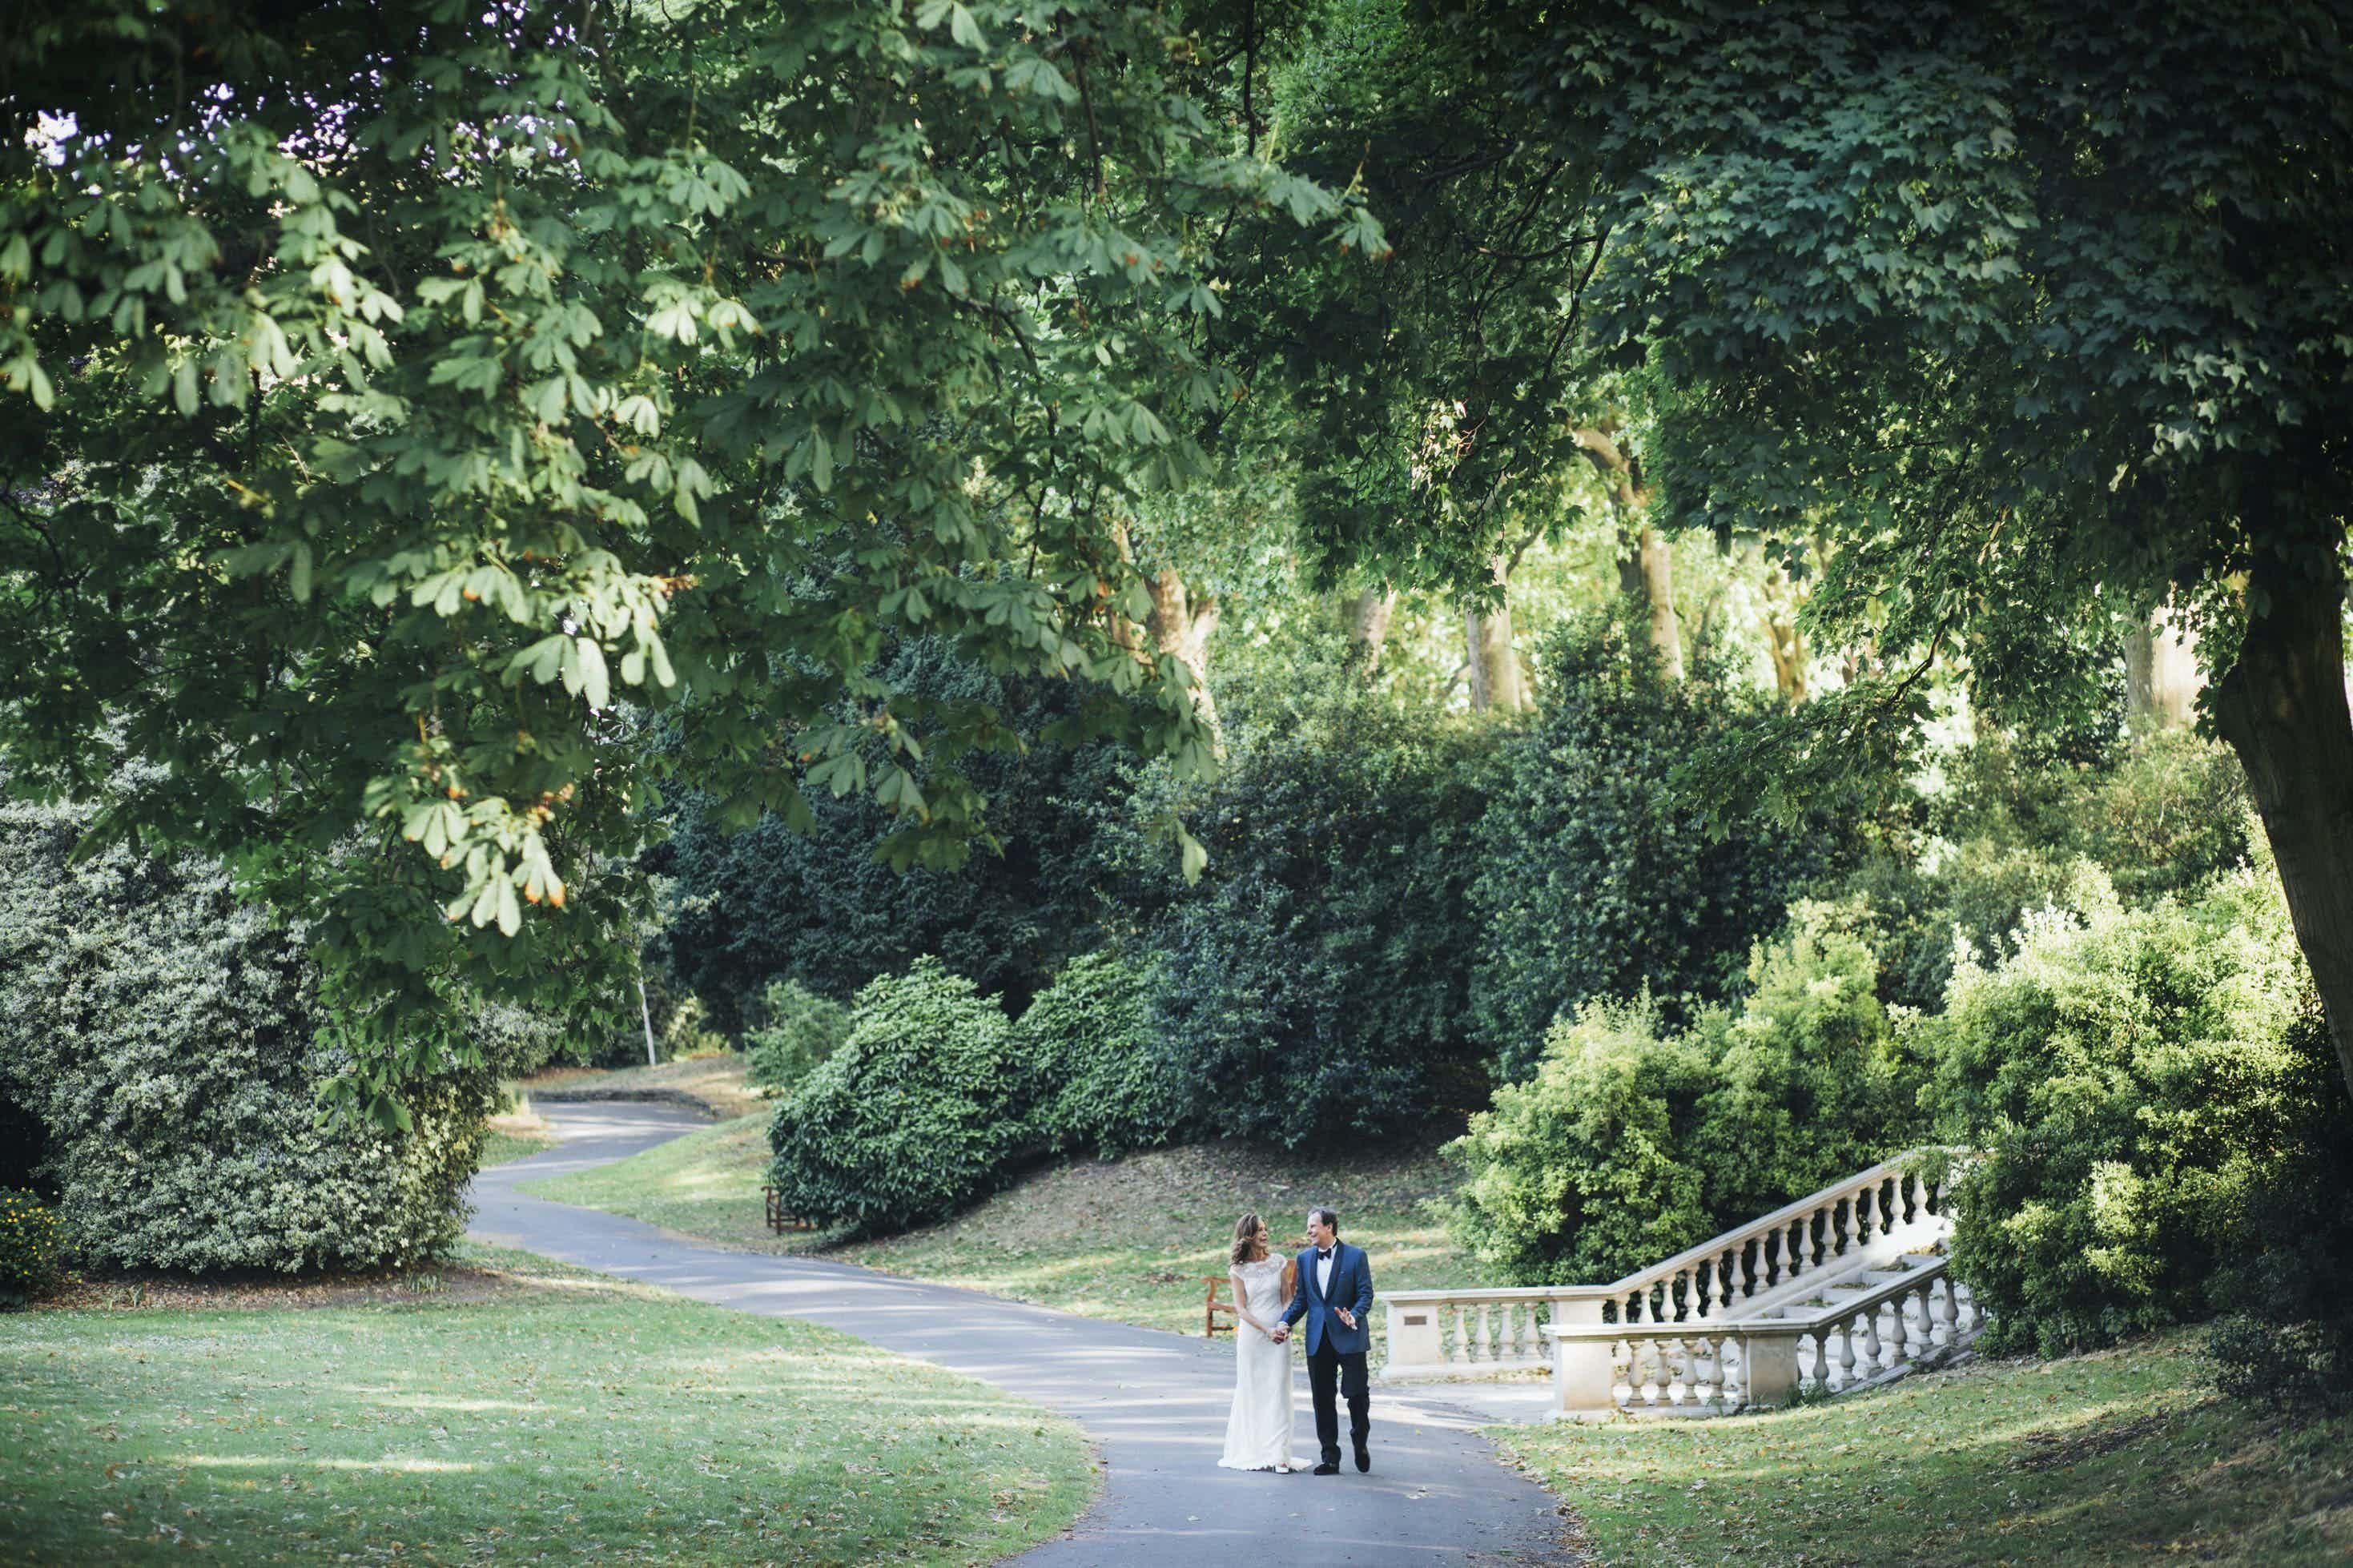 Ranelagh Gardens, Royal Hospital Chelsea